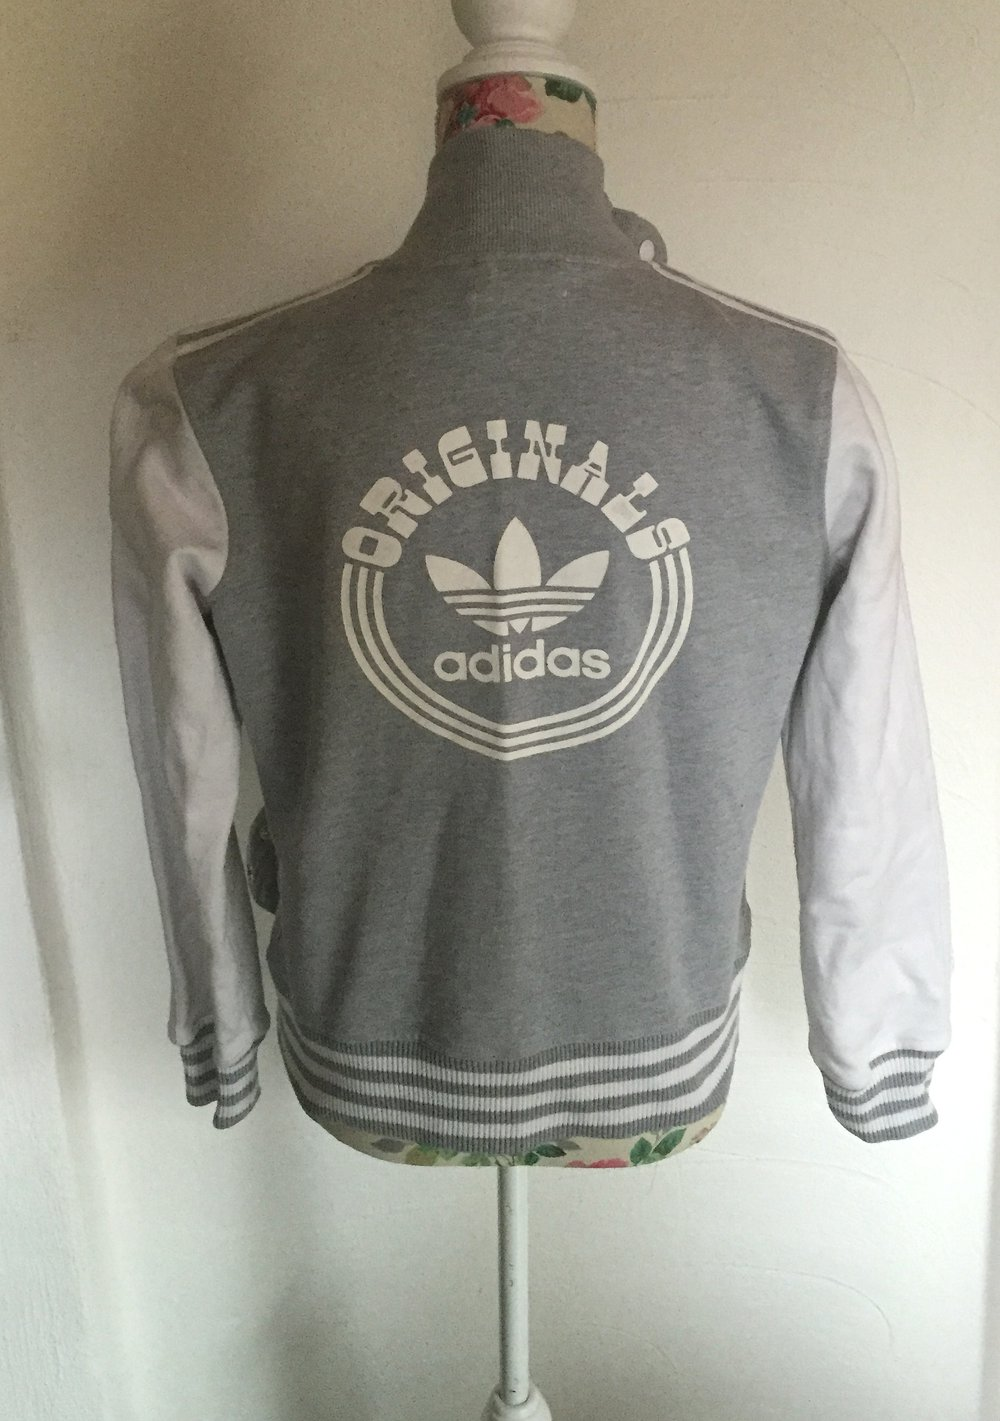 Adidas Originals Firebird College Jacke